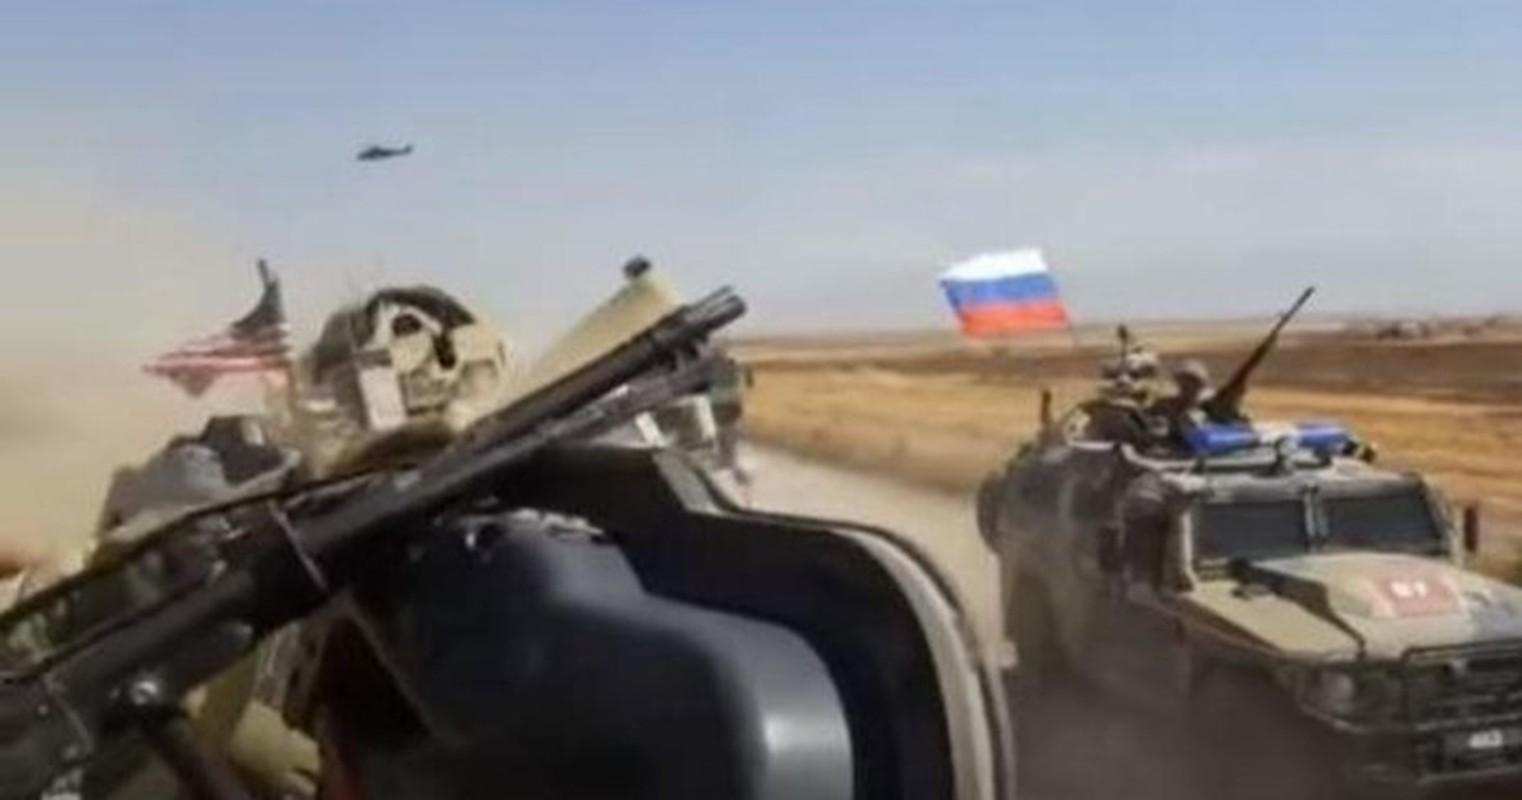 My de doa tan cong quan canh Nga o Syria sau va cham nghiem trong-Hinh-6